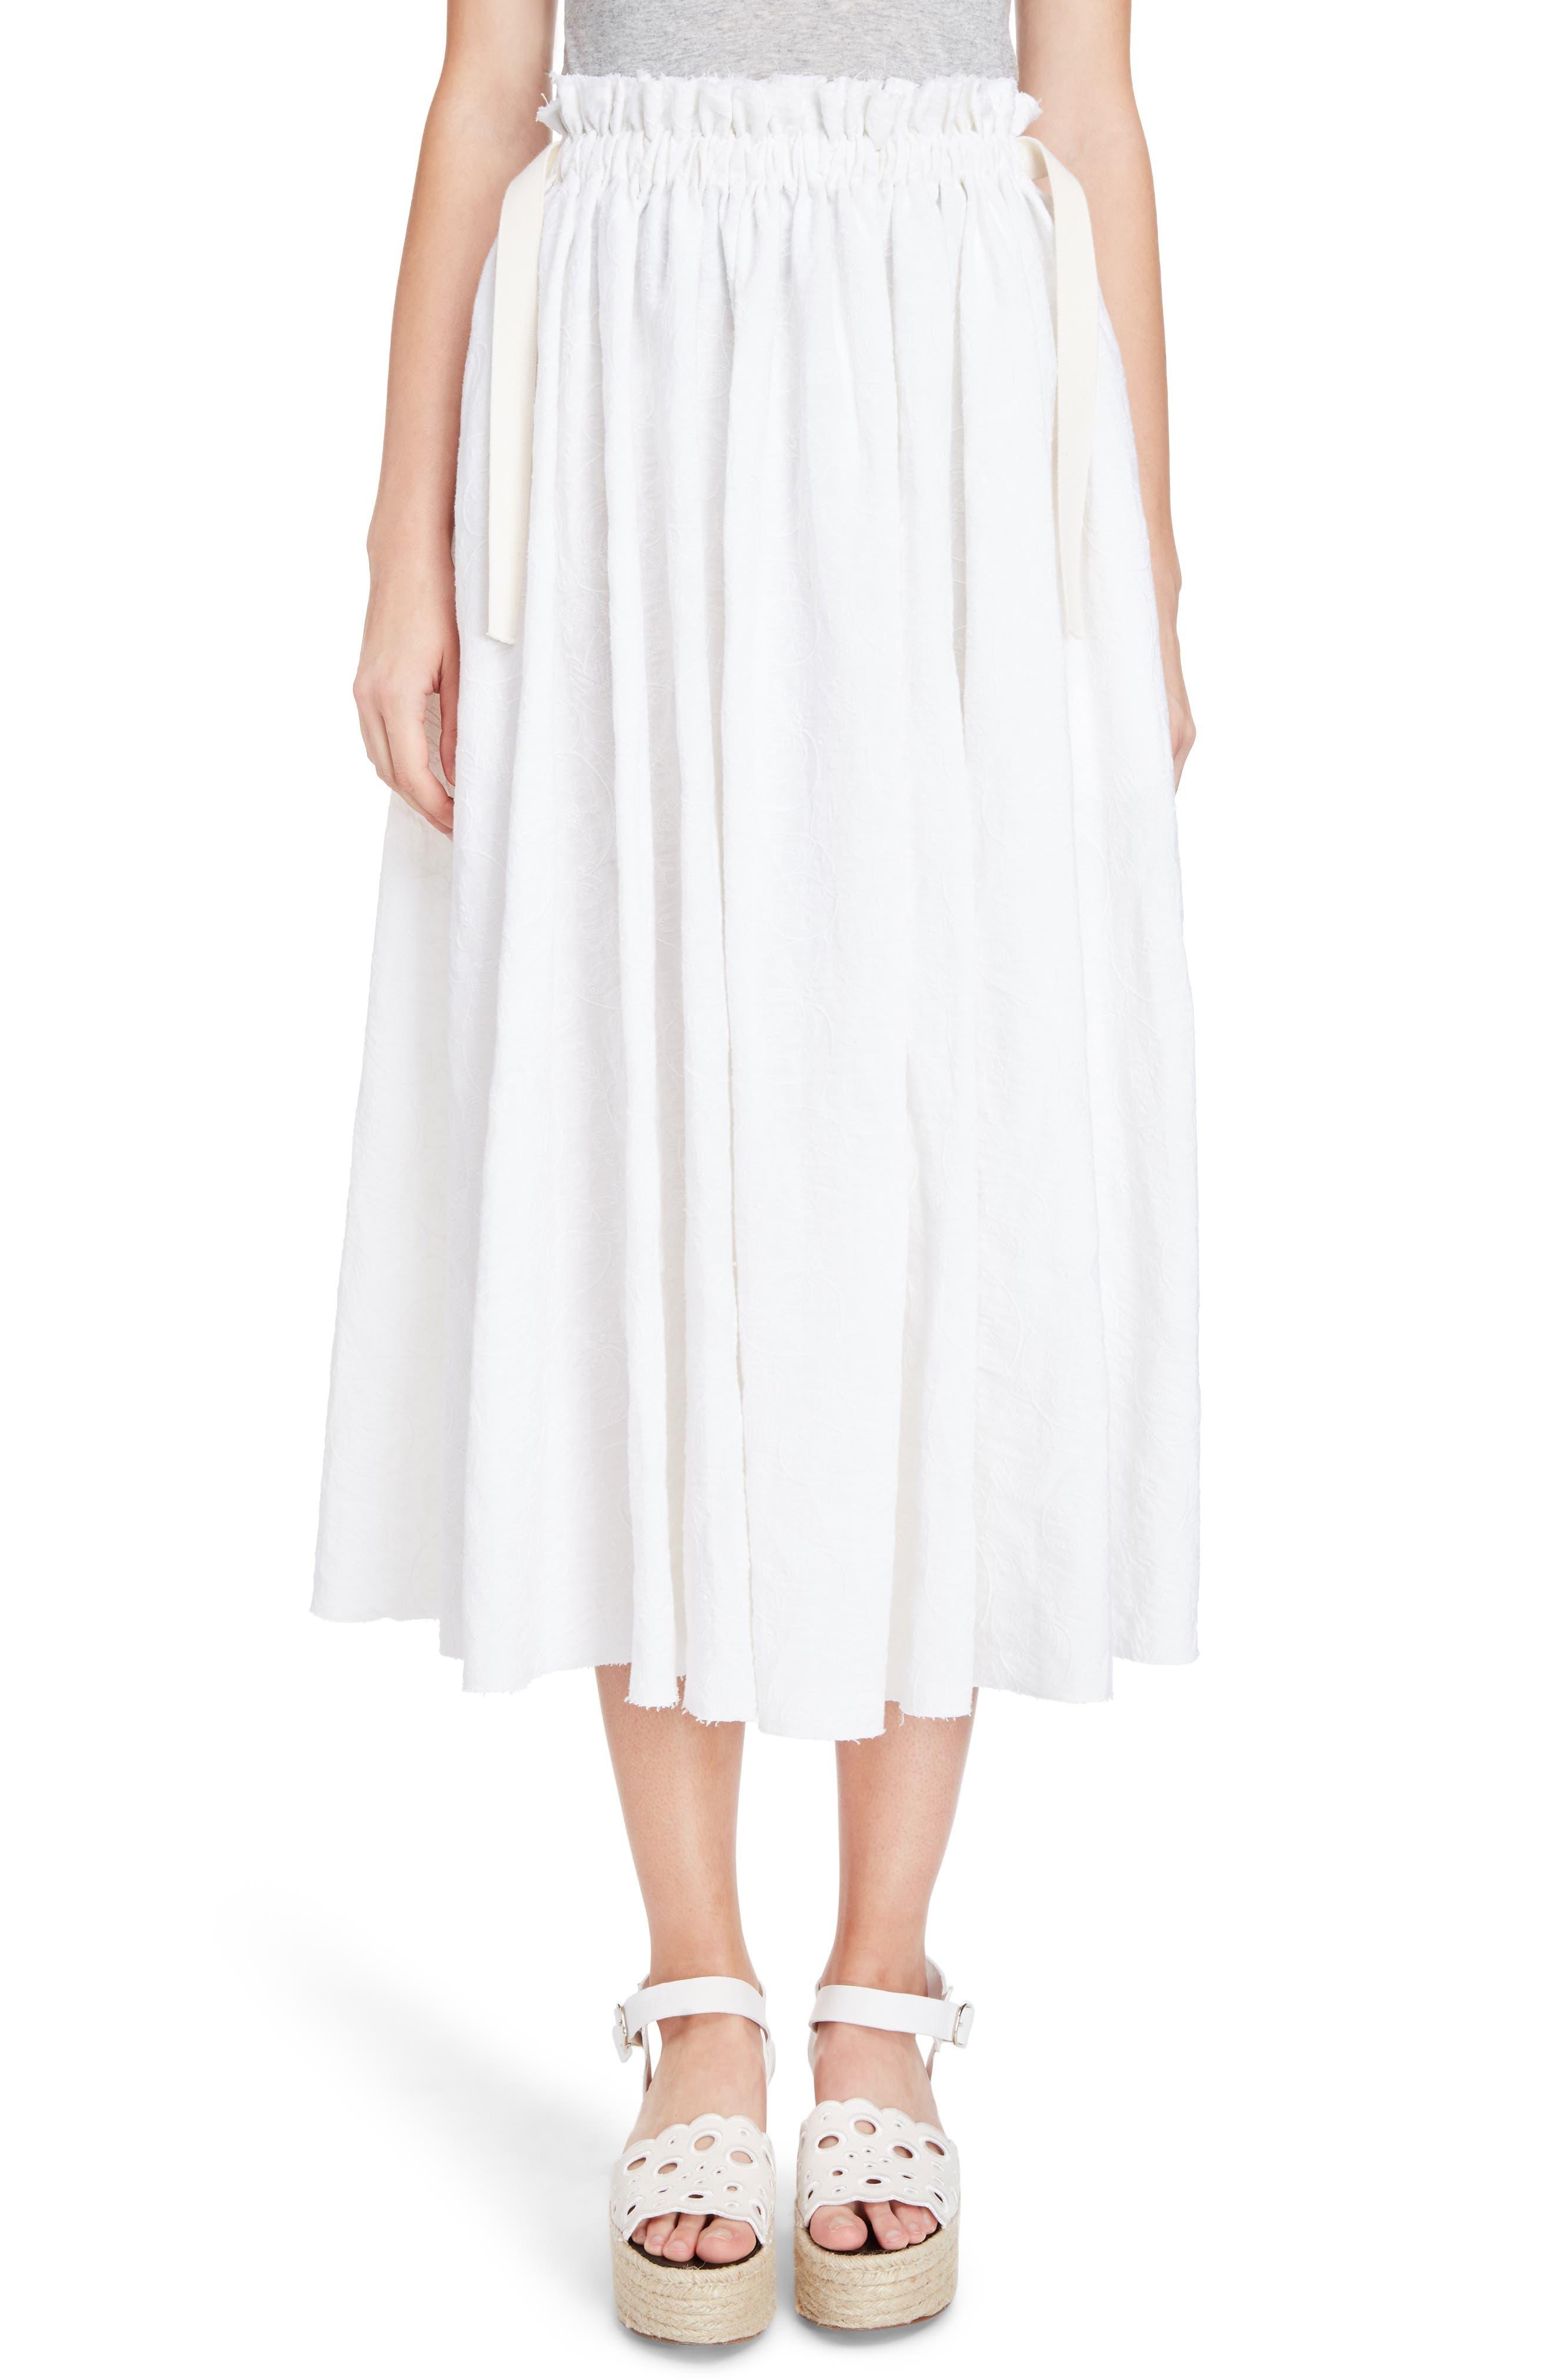 Main Image - Loewe Drawstring Waist Broderie Anglaise Skirt